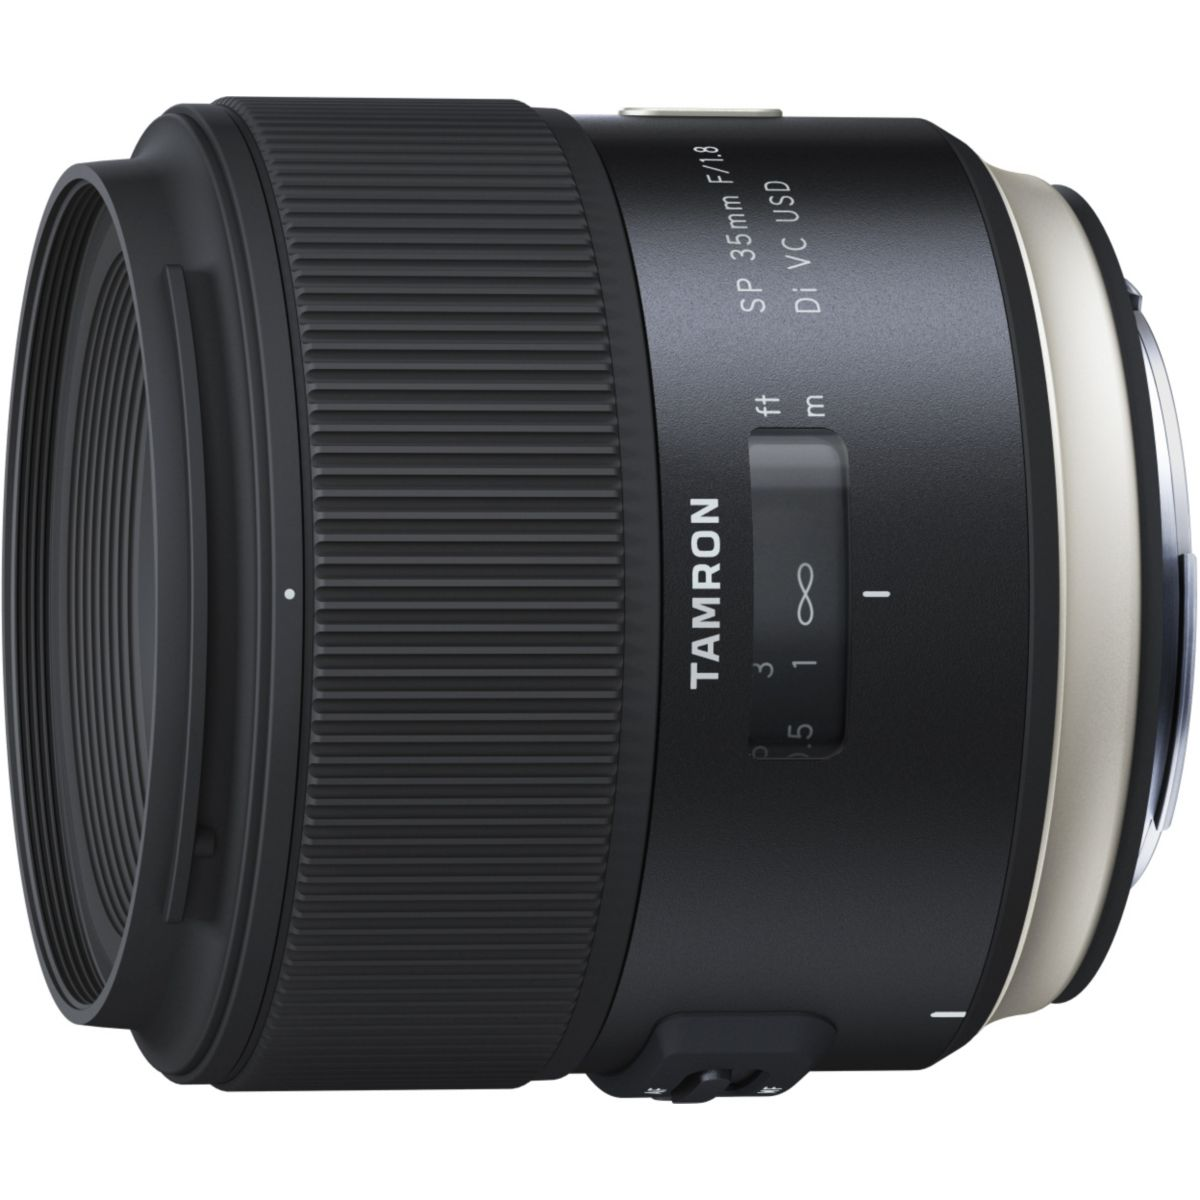 Objectif pour reflex tamron sp 35 mm f/1,8 di vc usd canon - 2...